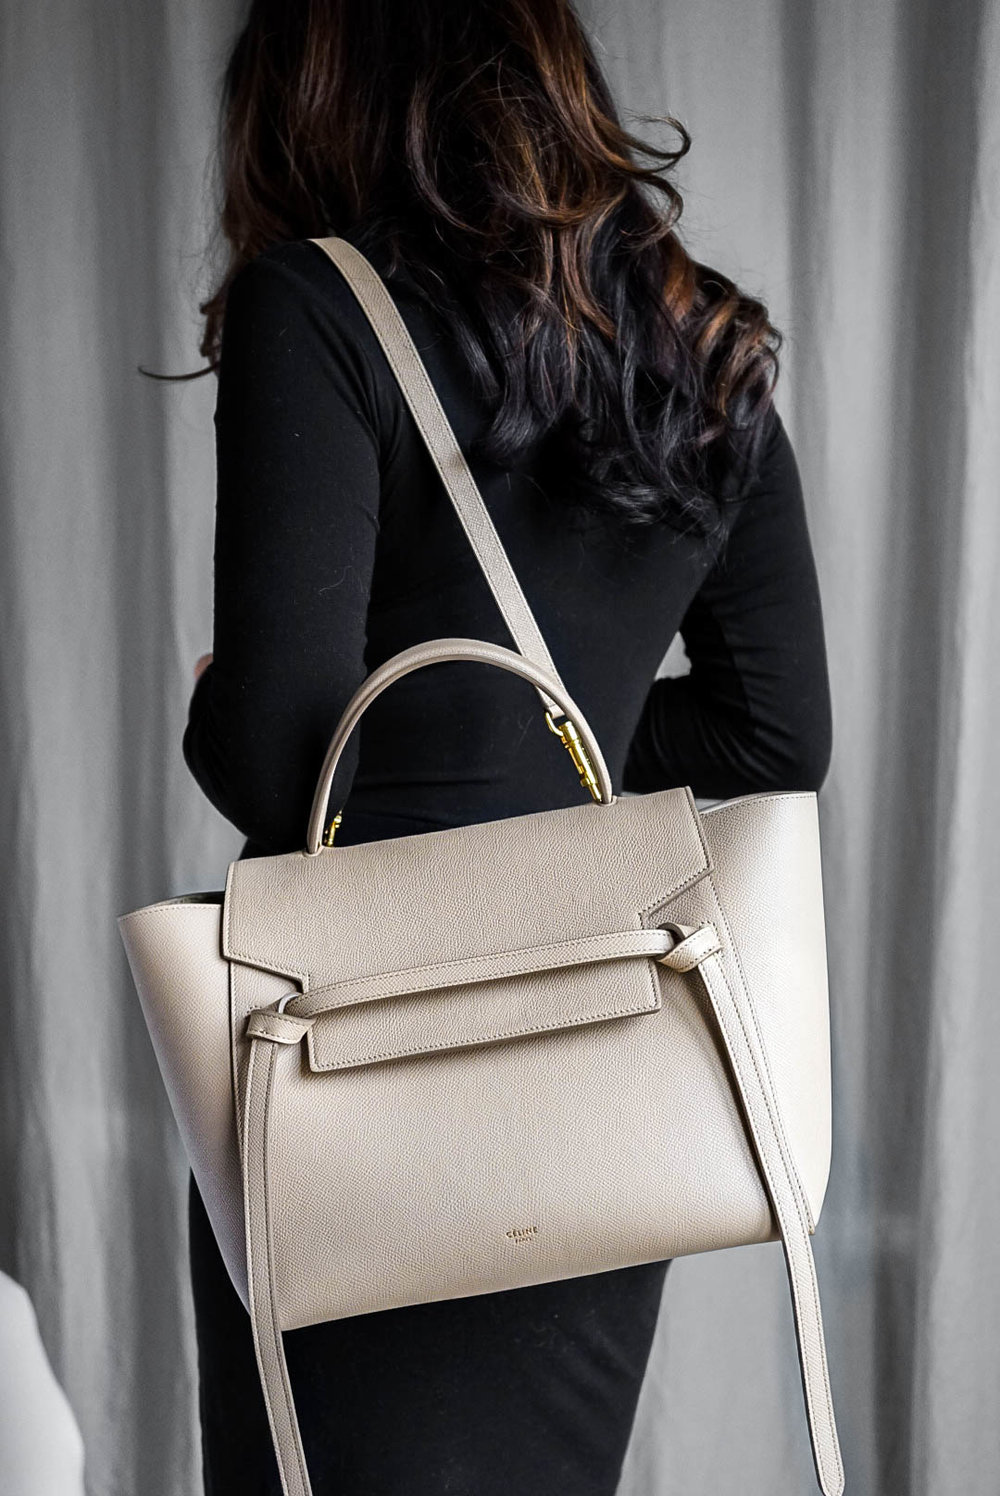 Celine Messenger Bag Review - TheNinesBlog.com: A Boston Blog